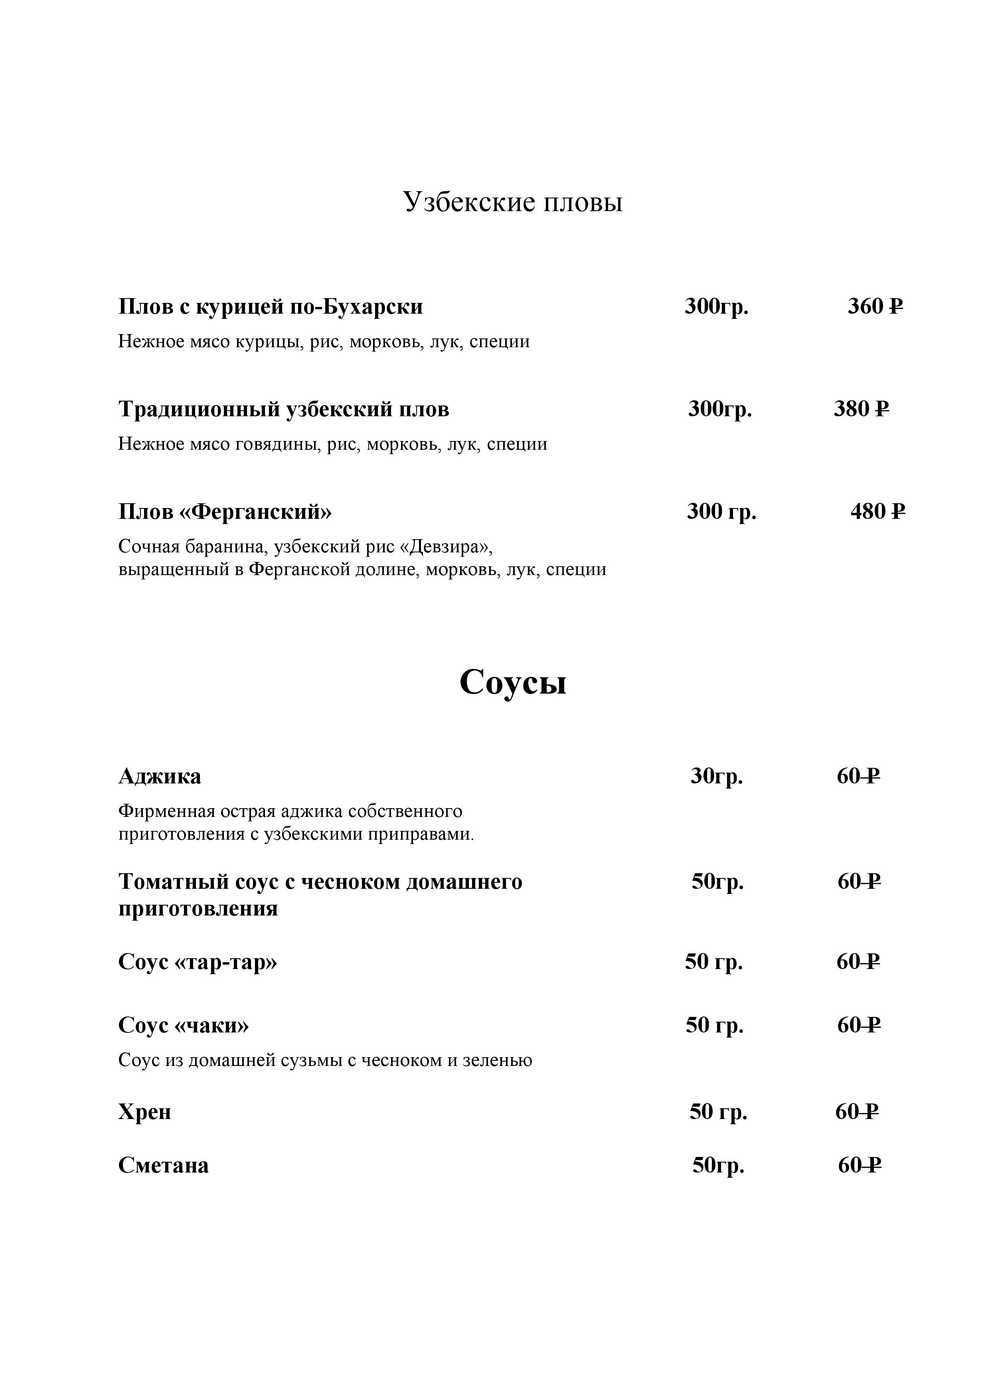 Меню ресторана Навруз на Ленинском проспекте фото 8